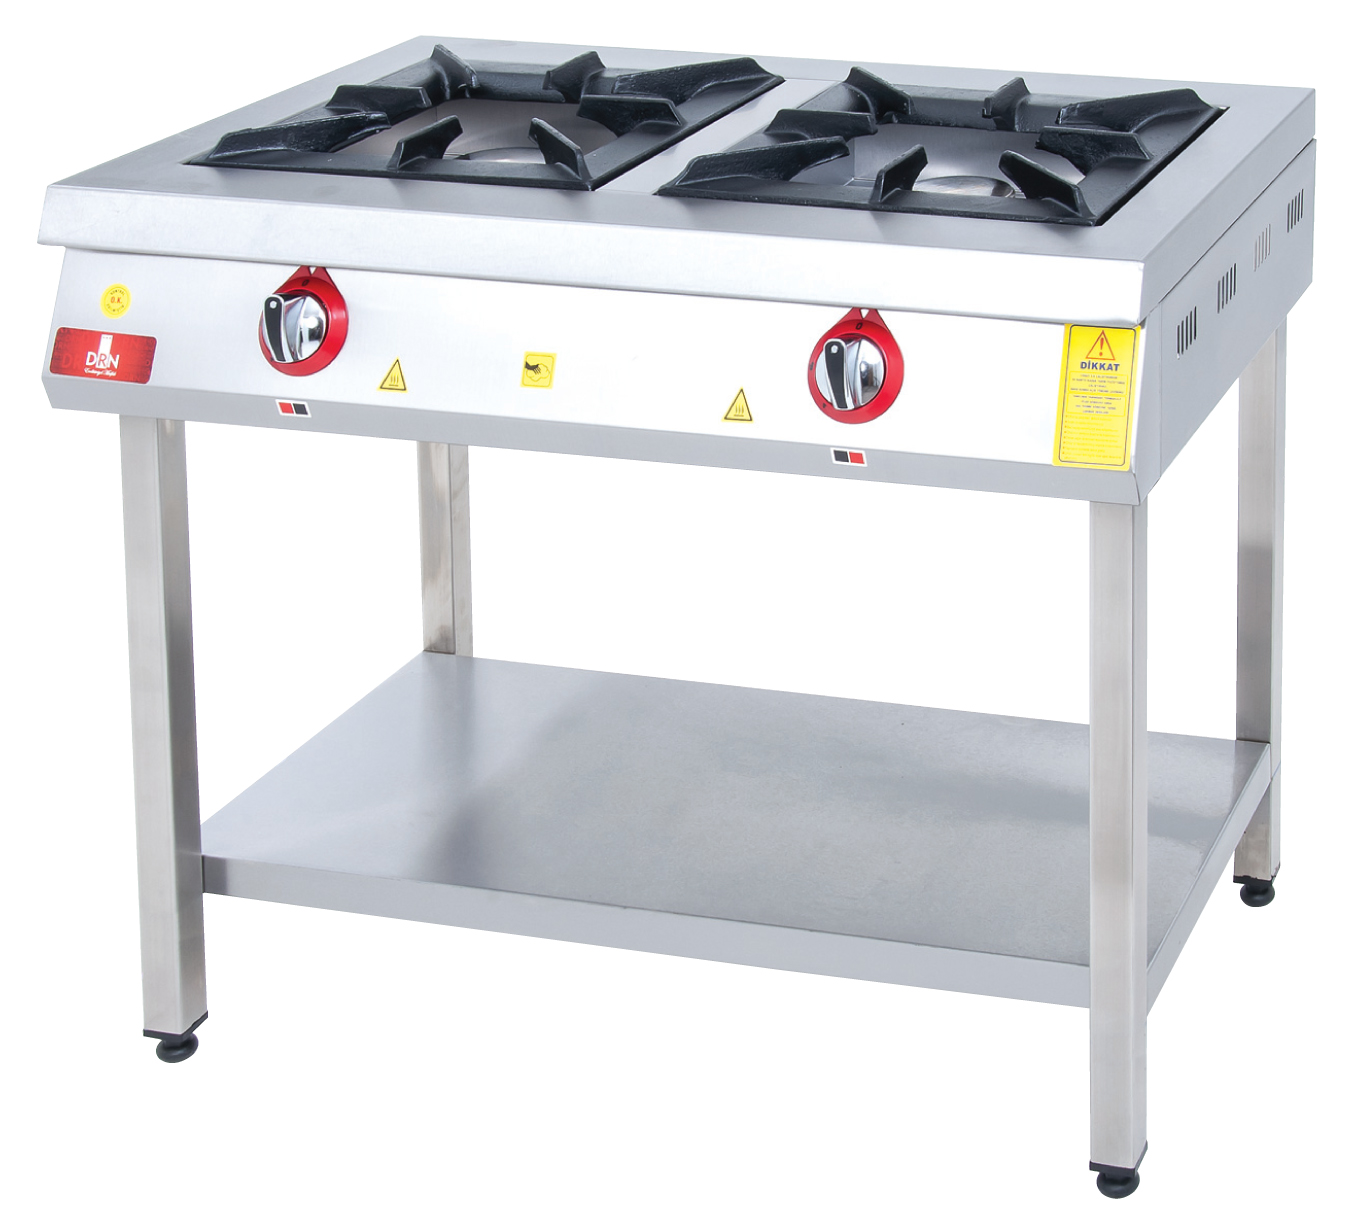 Range and Bottom-Shelf - 2 Burners - 100x60 - Gas